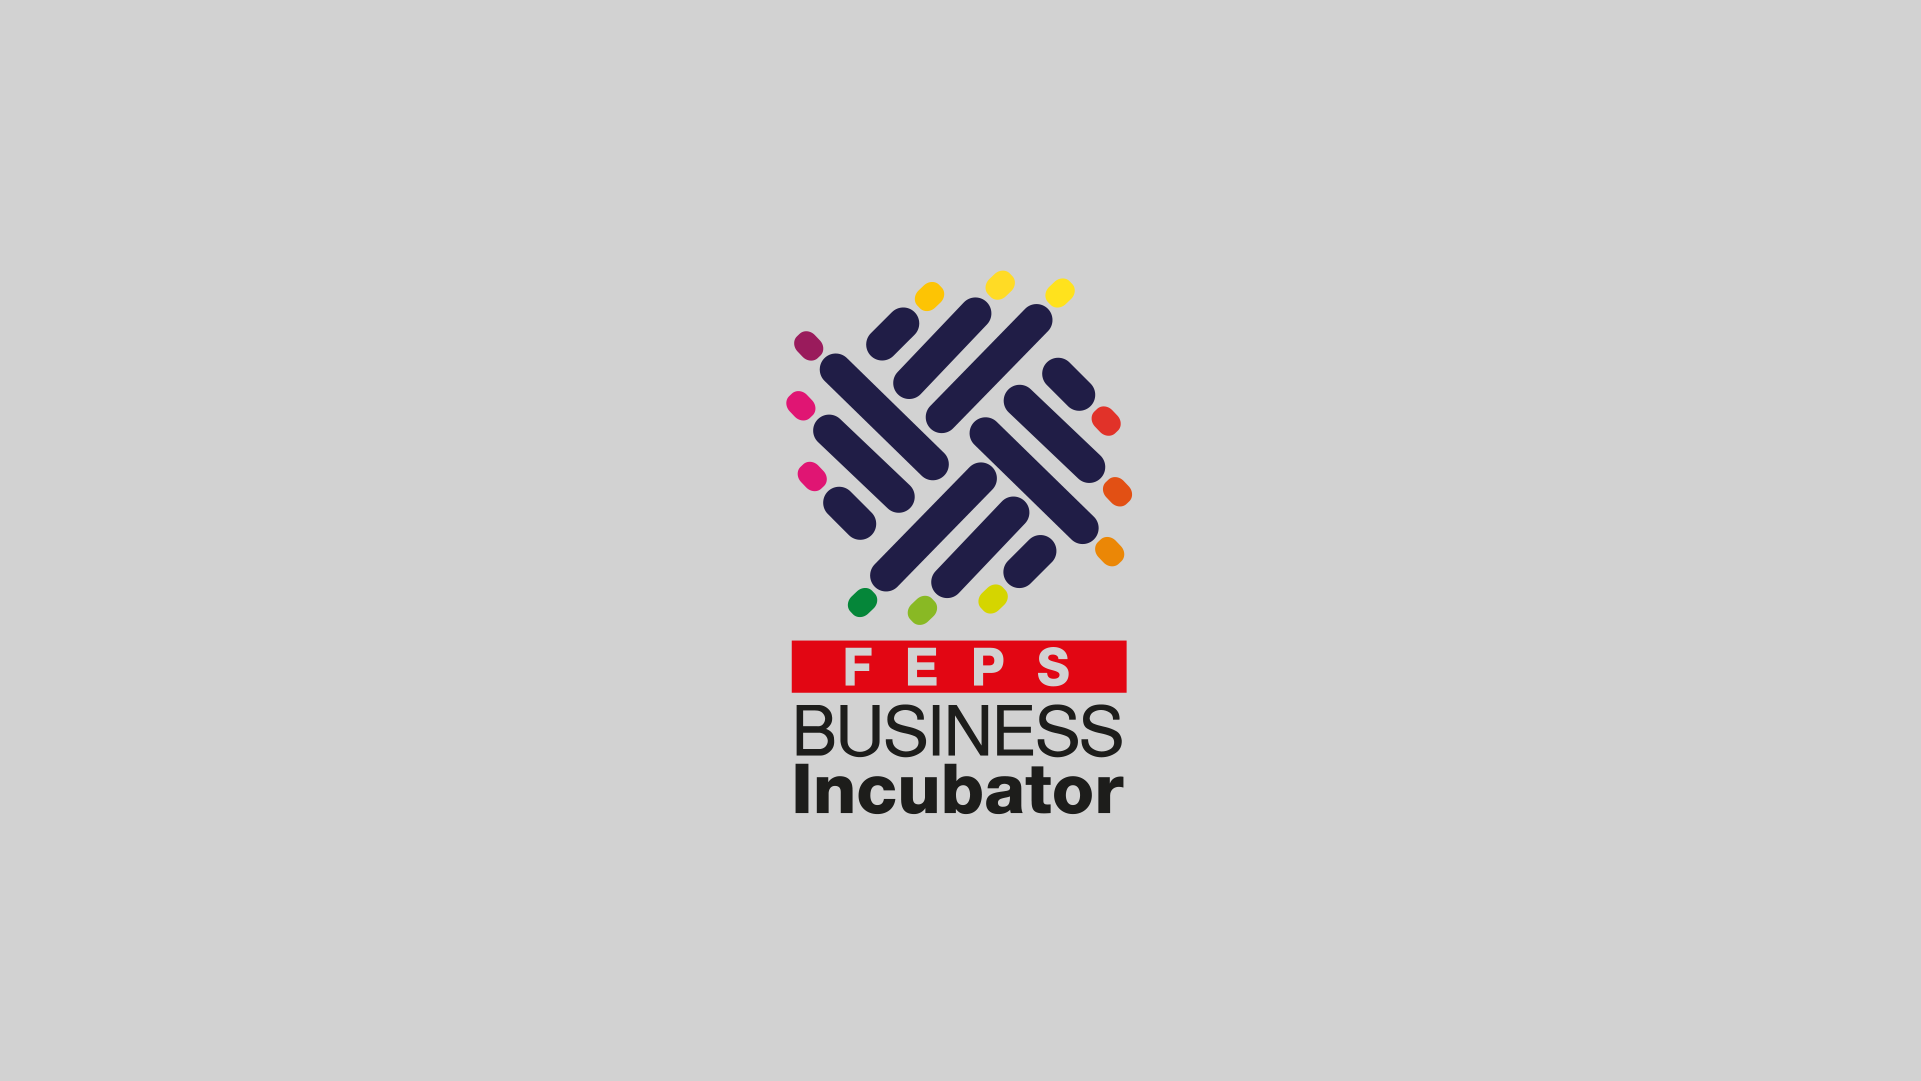 FEPS Business Incubator